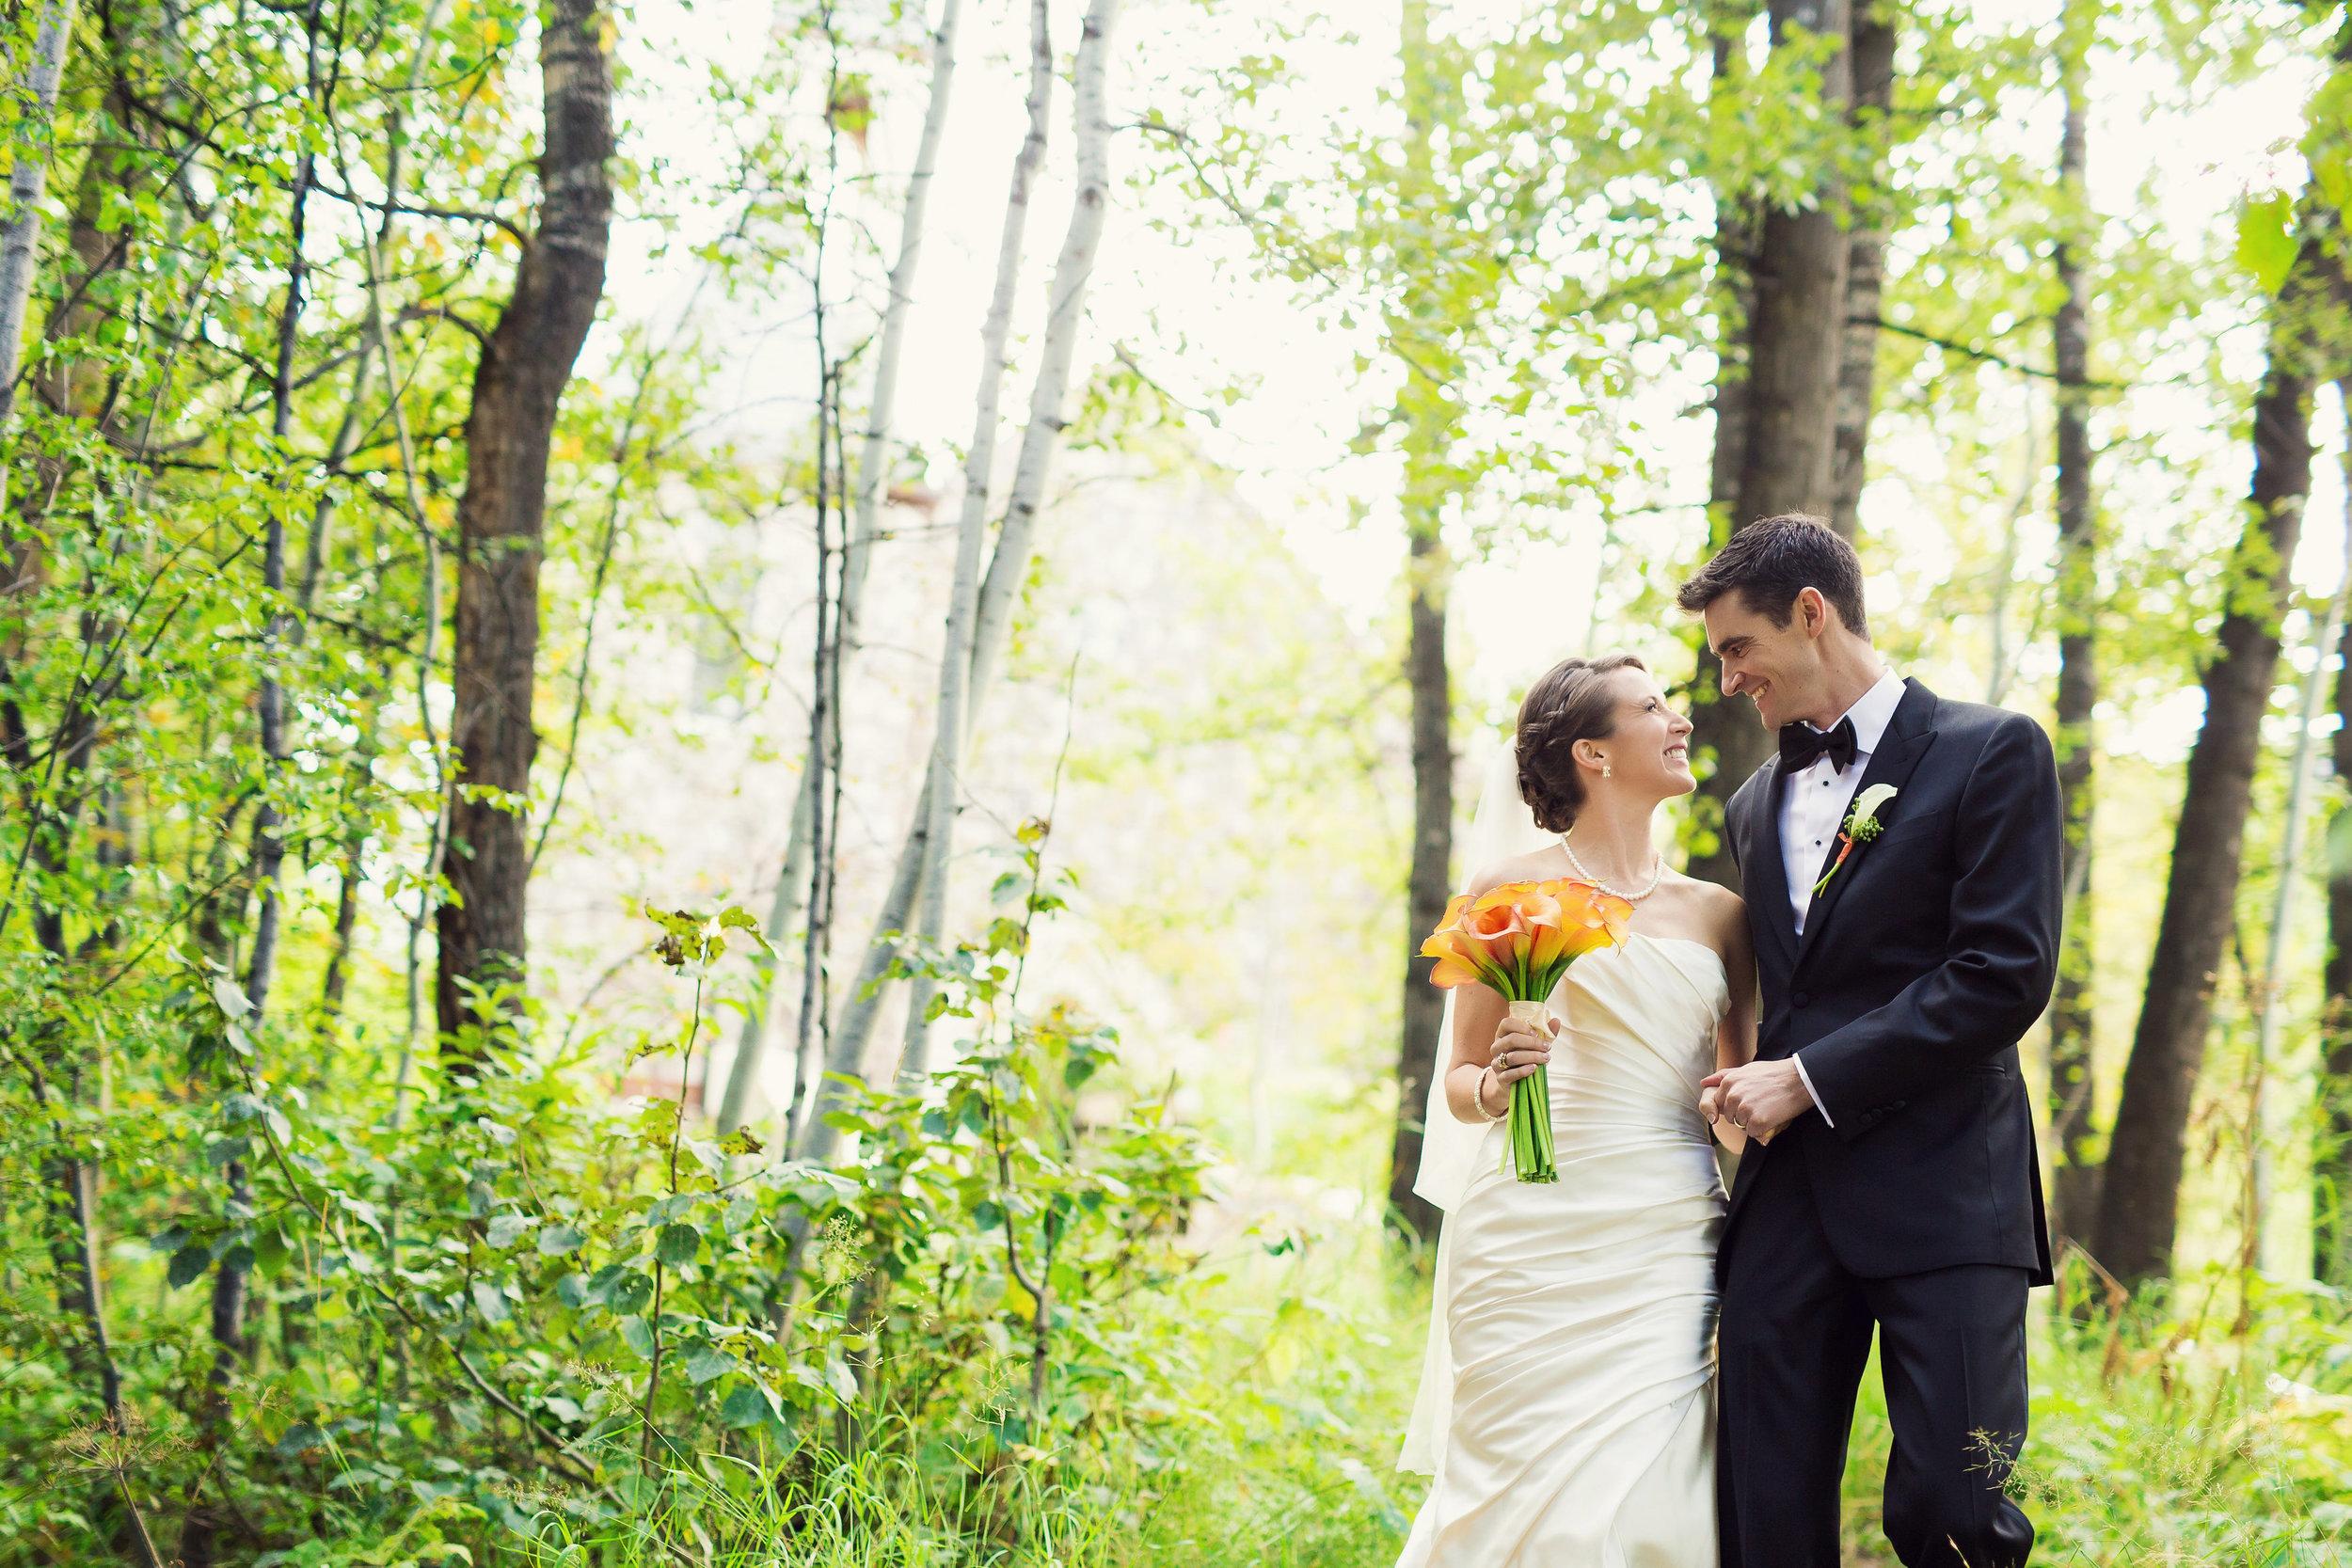 2015-09-06-WEDDING-NELSONANDALISSA-0779.jpg